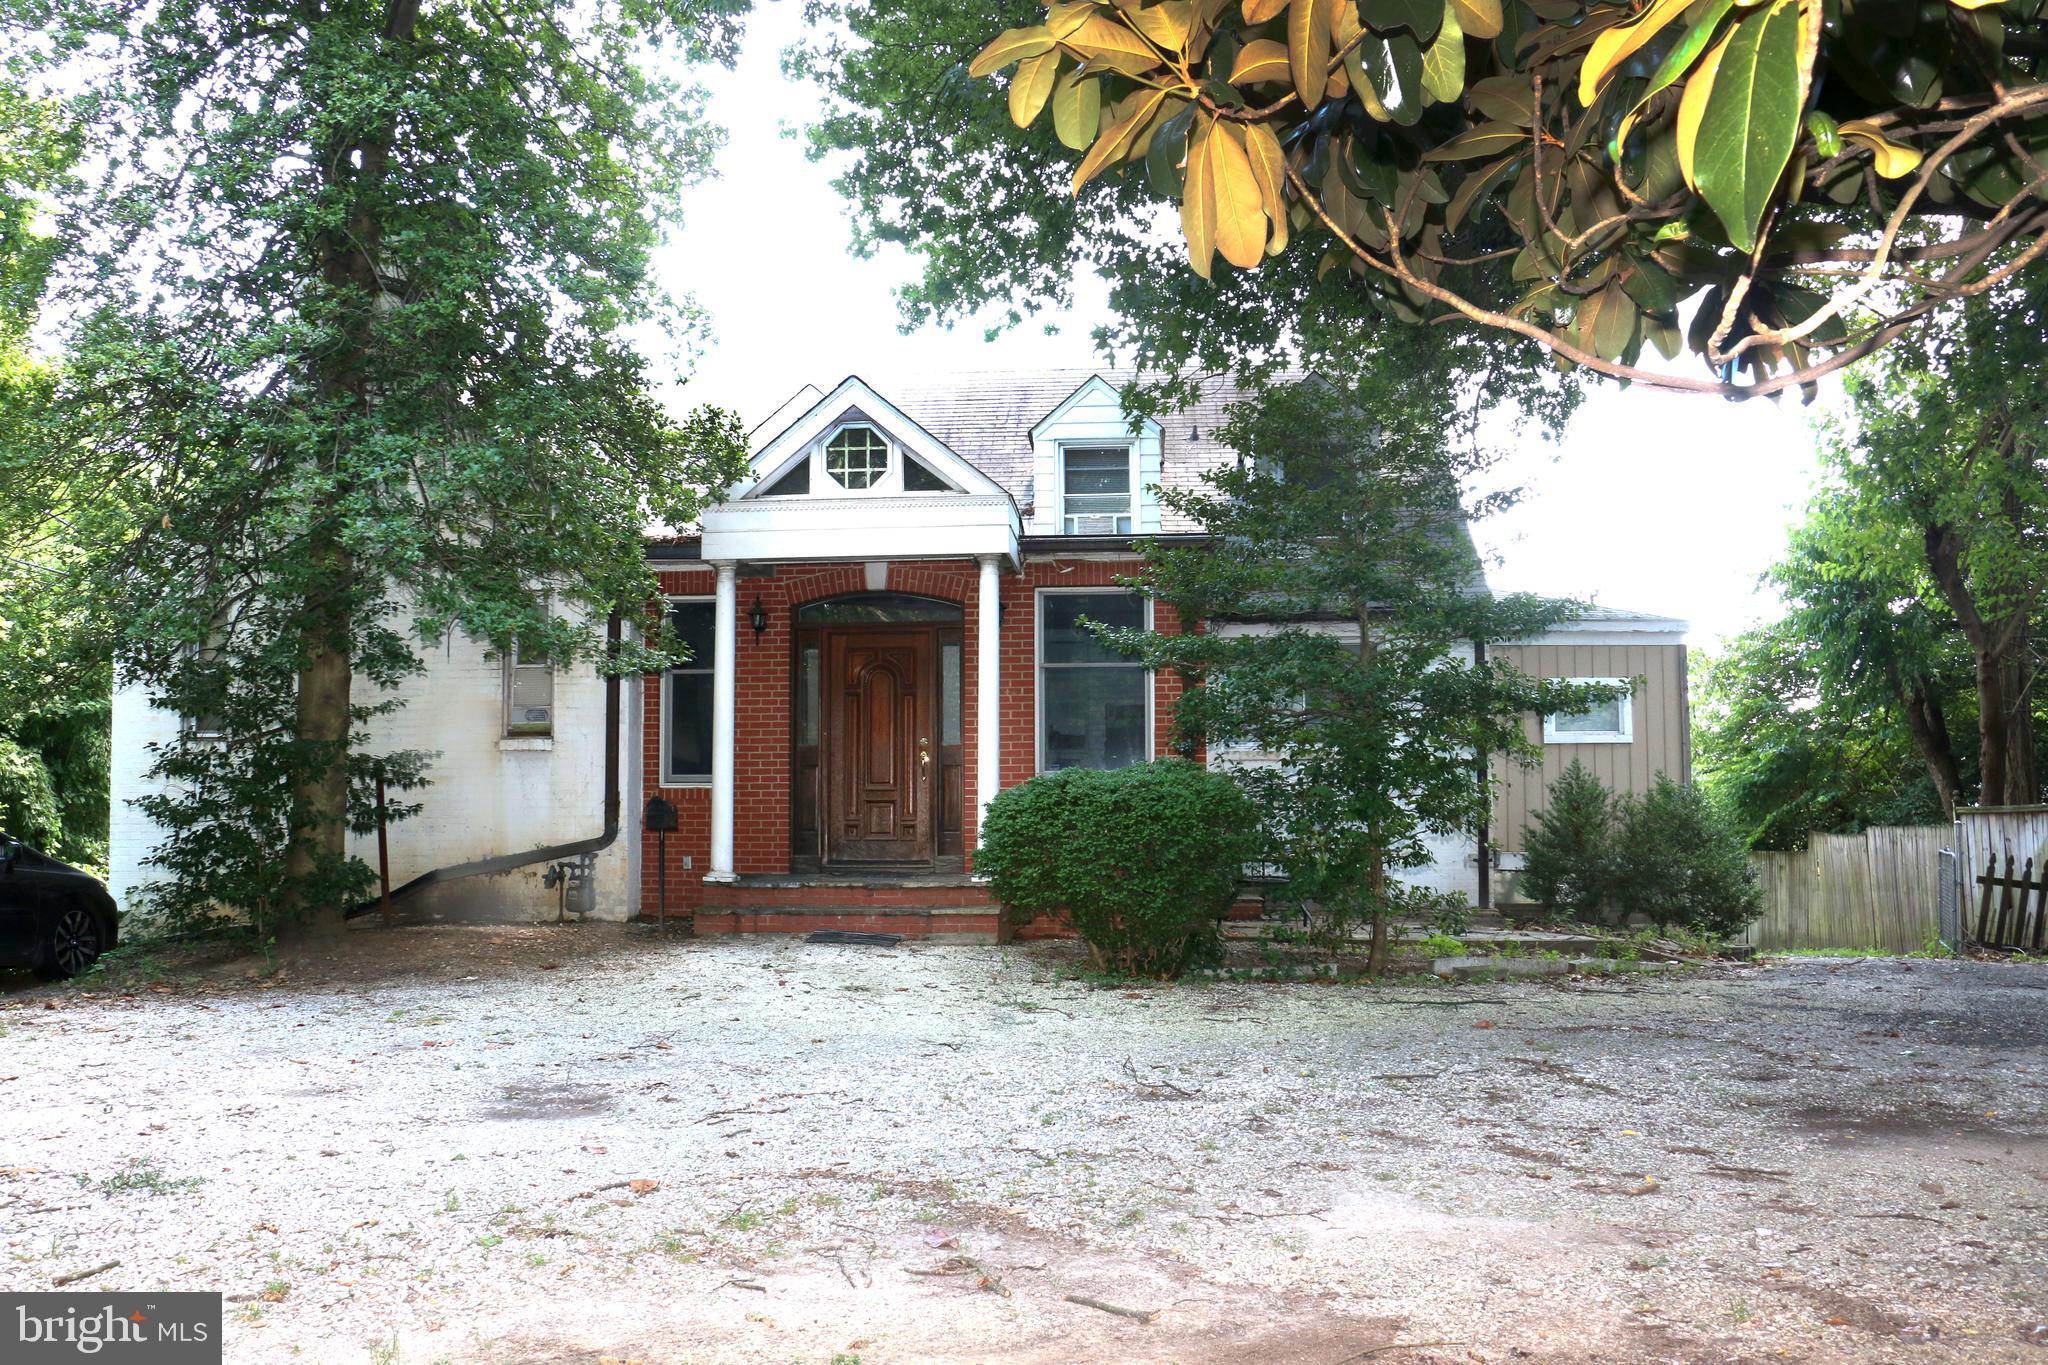 Arlington VA Luxury Homes For Sale | | IDXLord and Saunders